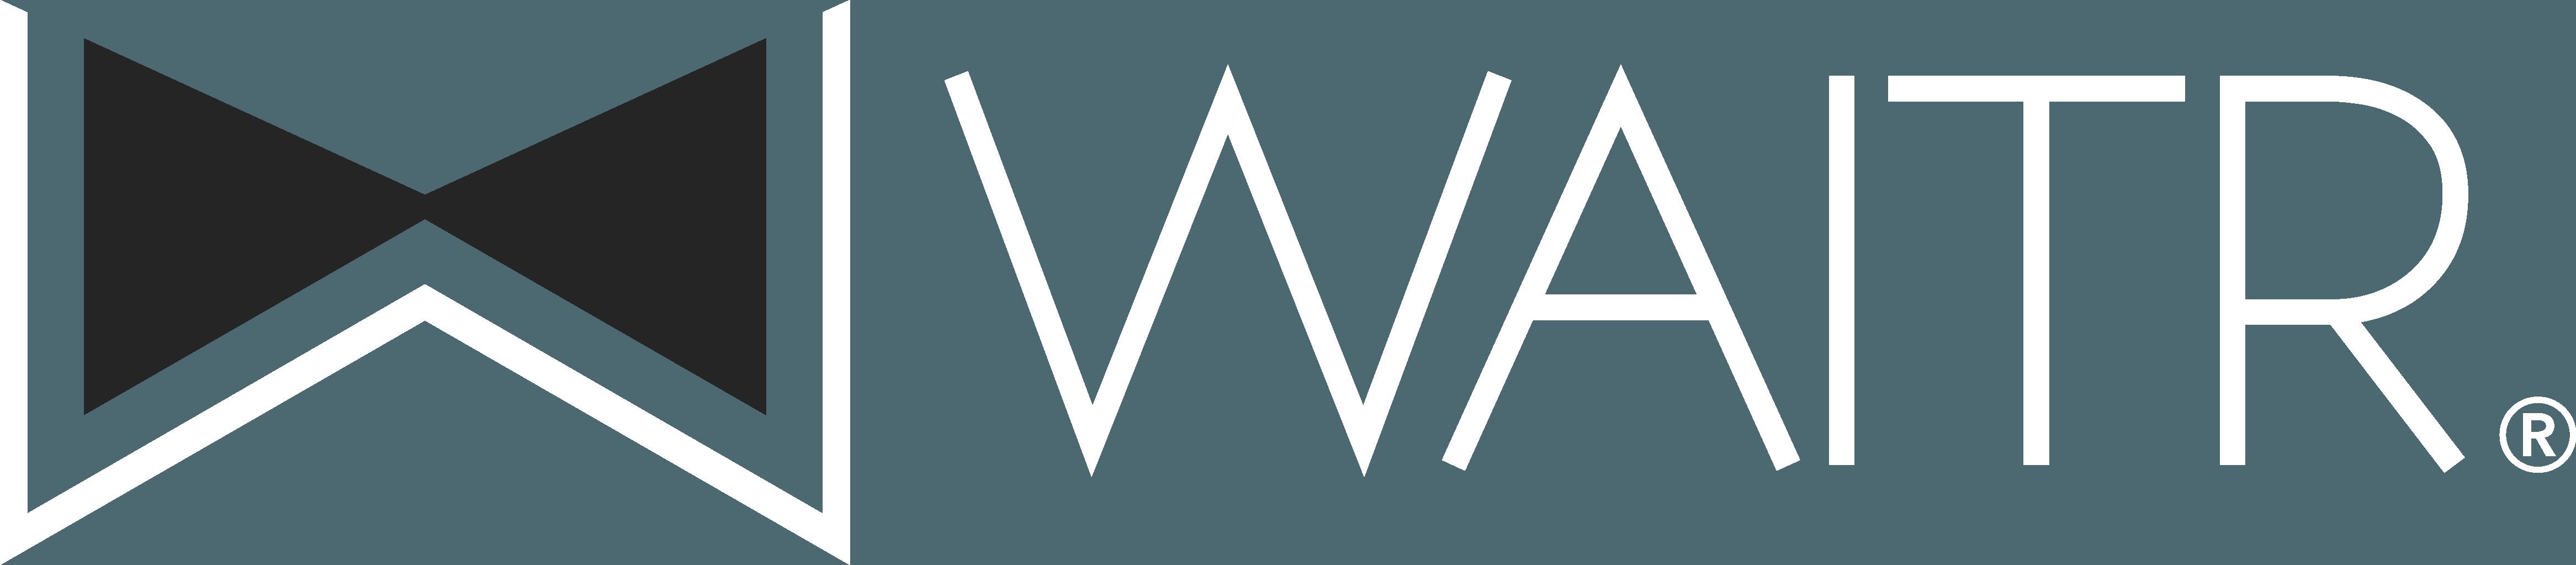 Waitr Logo.